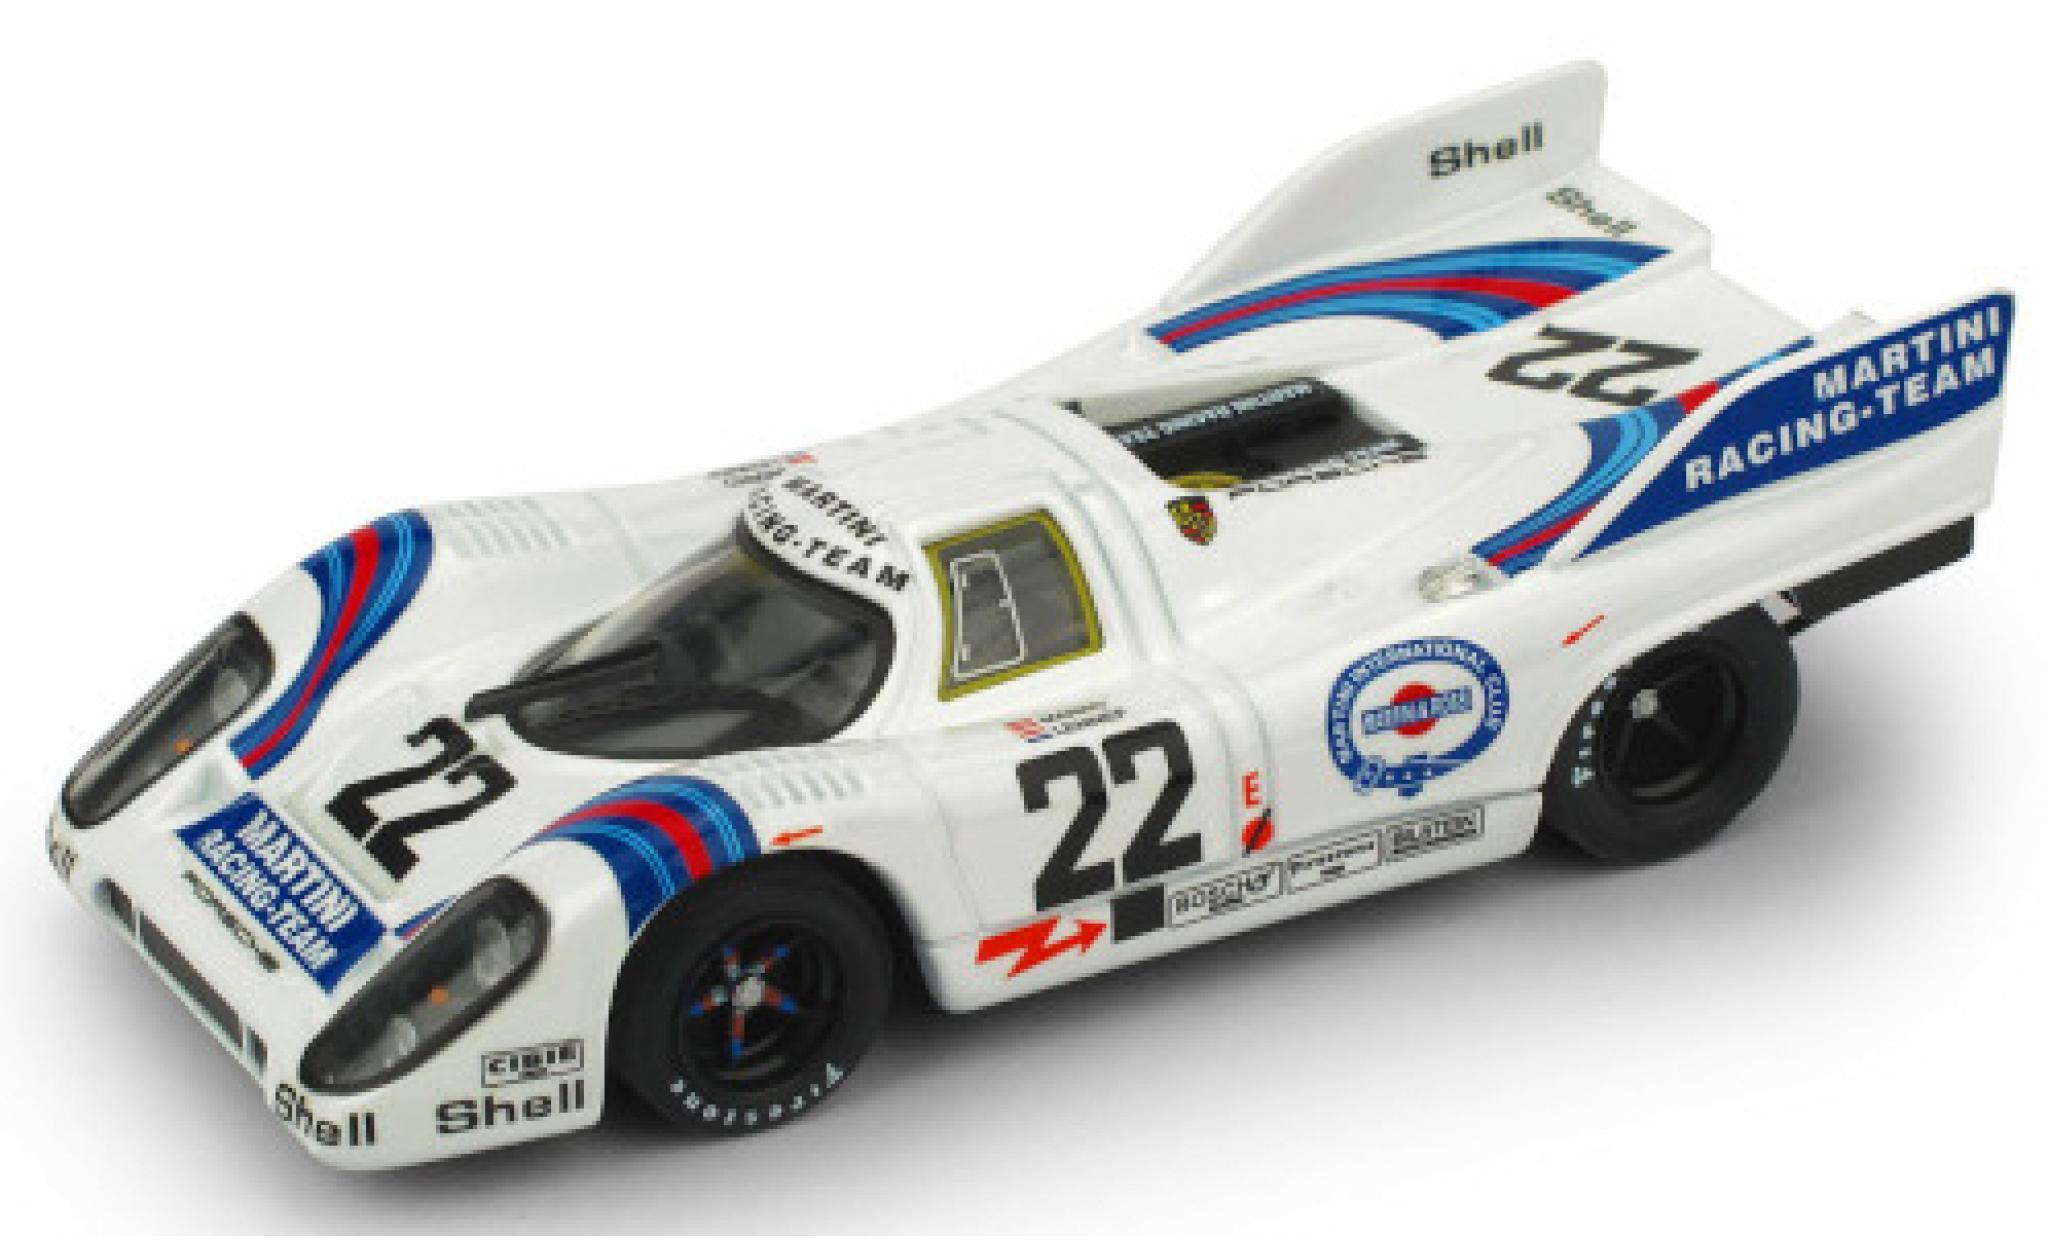 Porsche 917 1971 1/43 Brumm K RHD No.22 Martini Racing Team Martini 24h Le Mans H.Marko/G.van Lennep